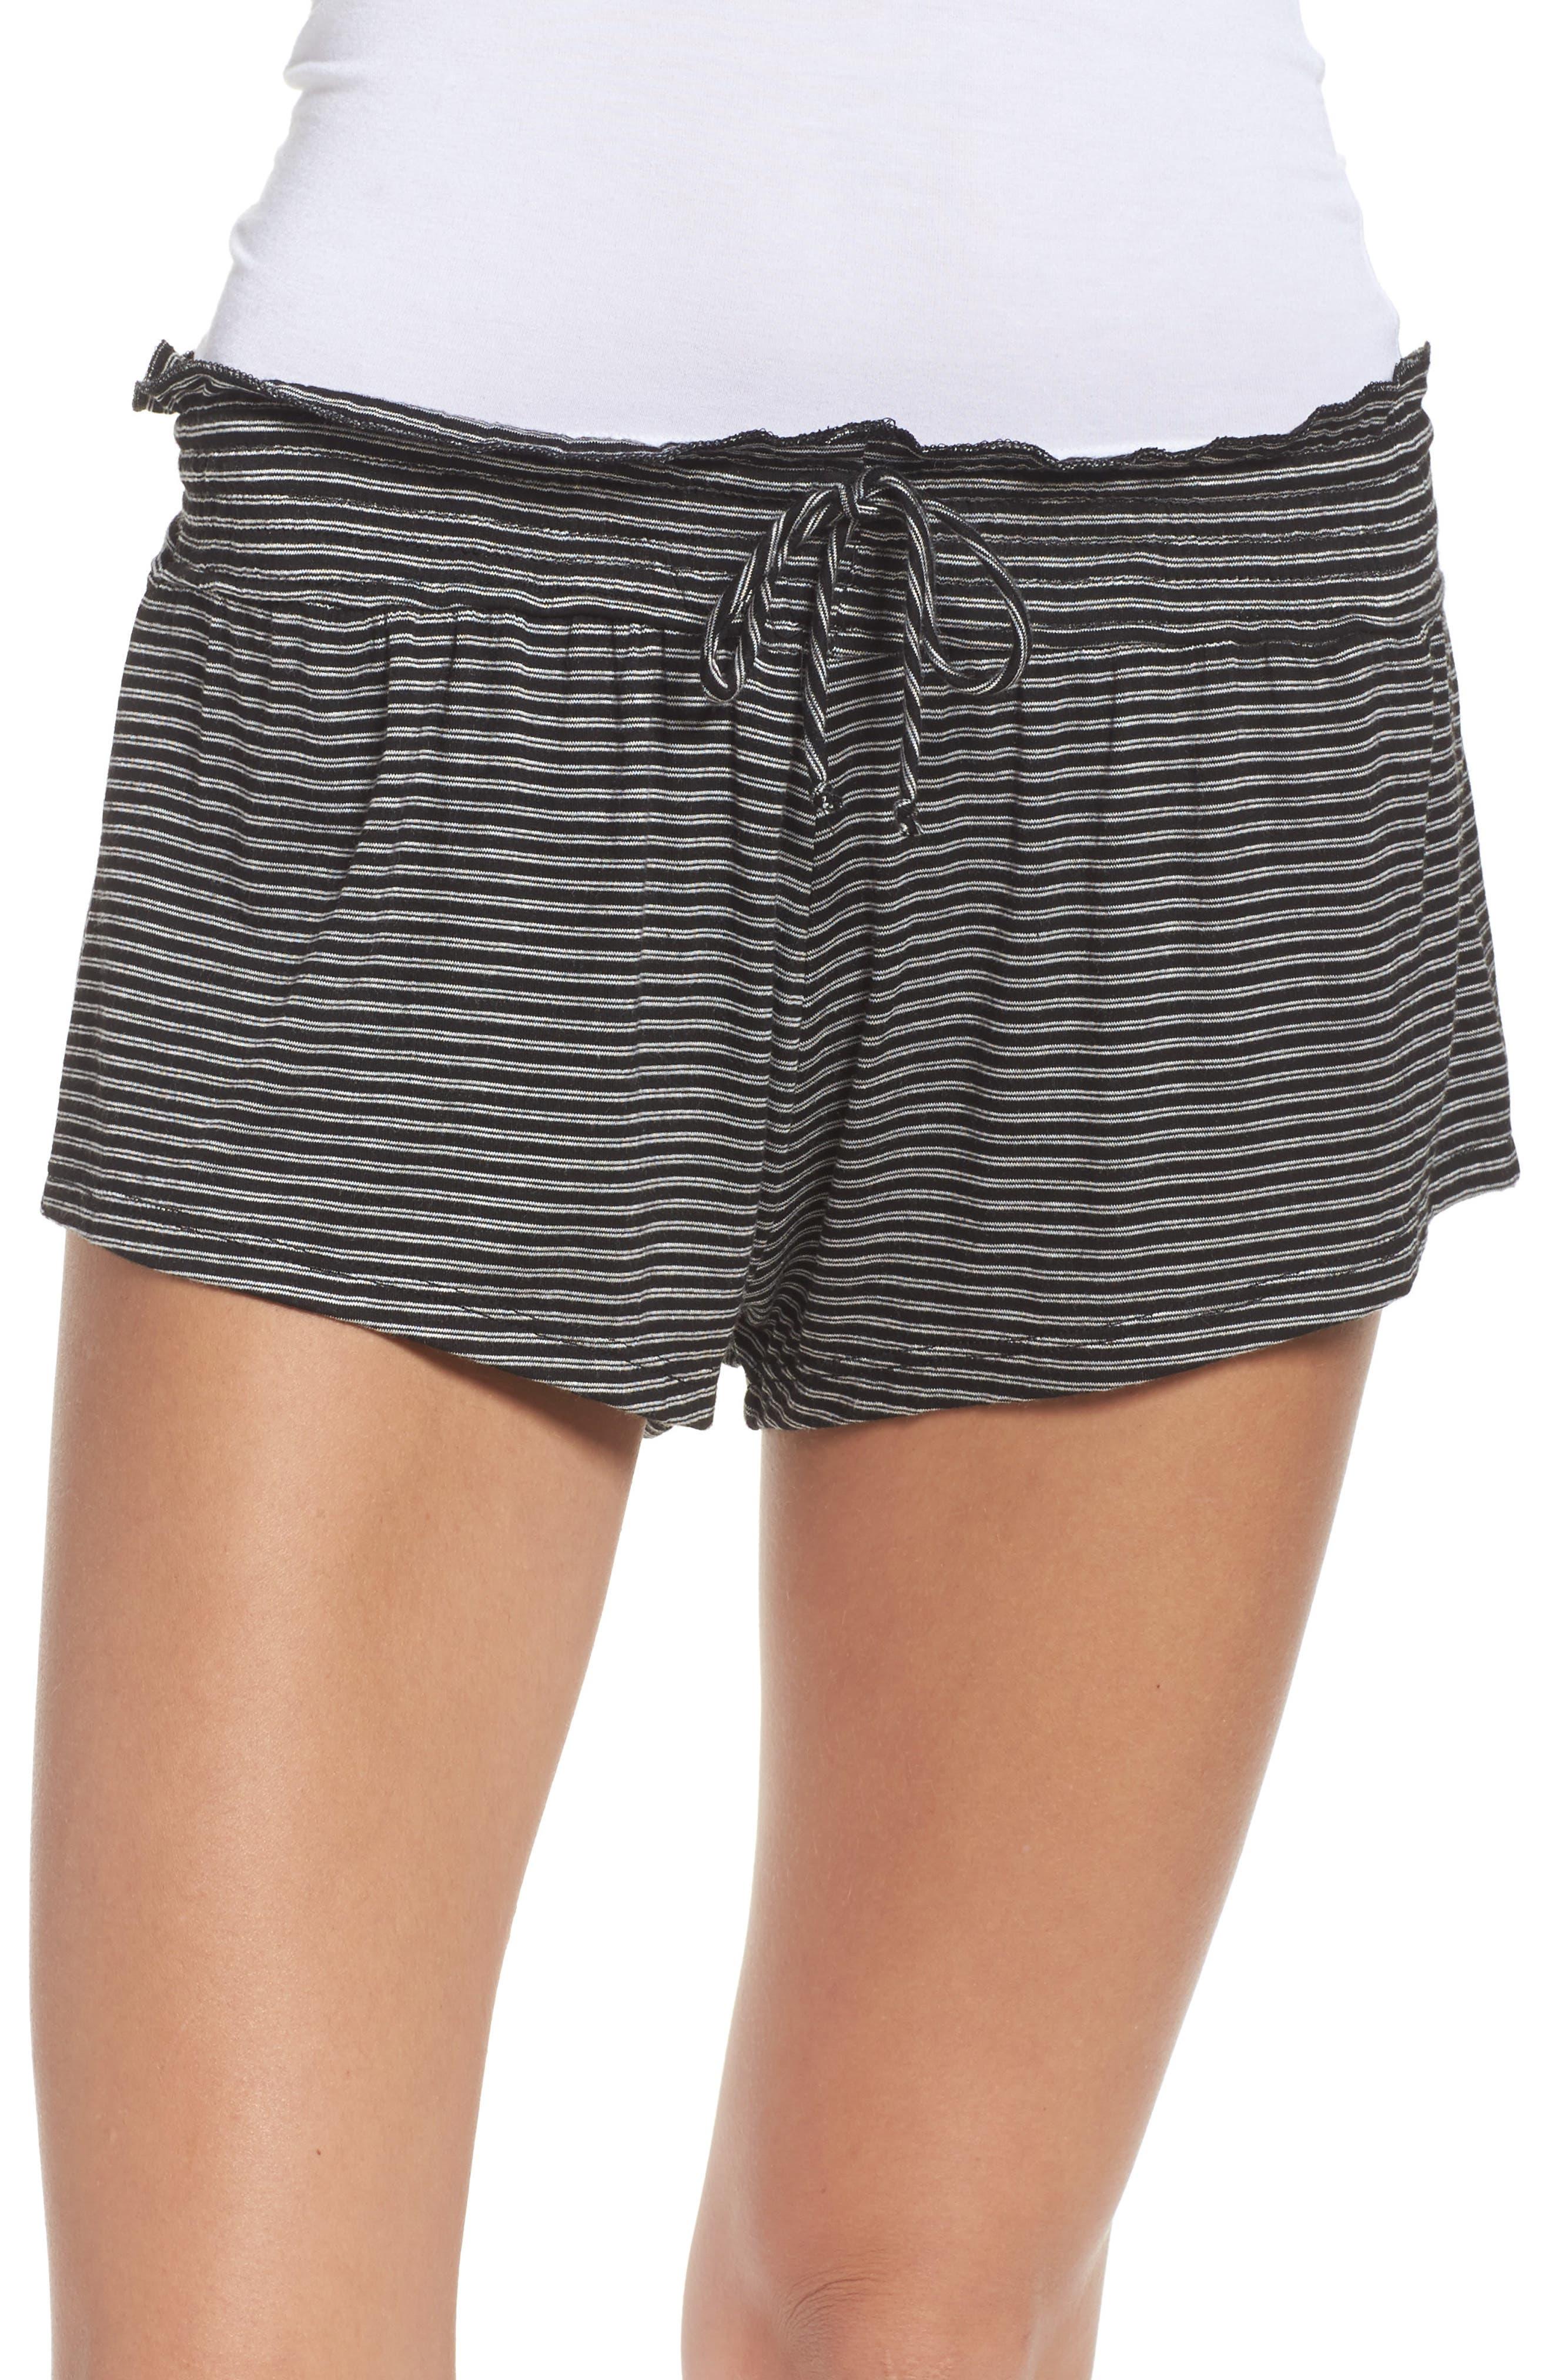 OLYMPIA THEODORA Dallas Lounge Shorts